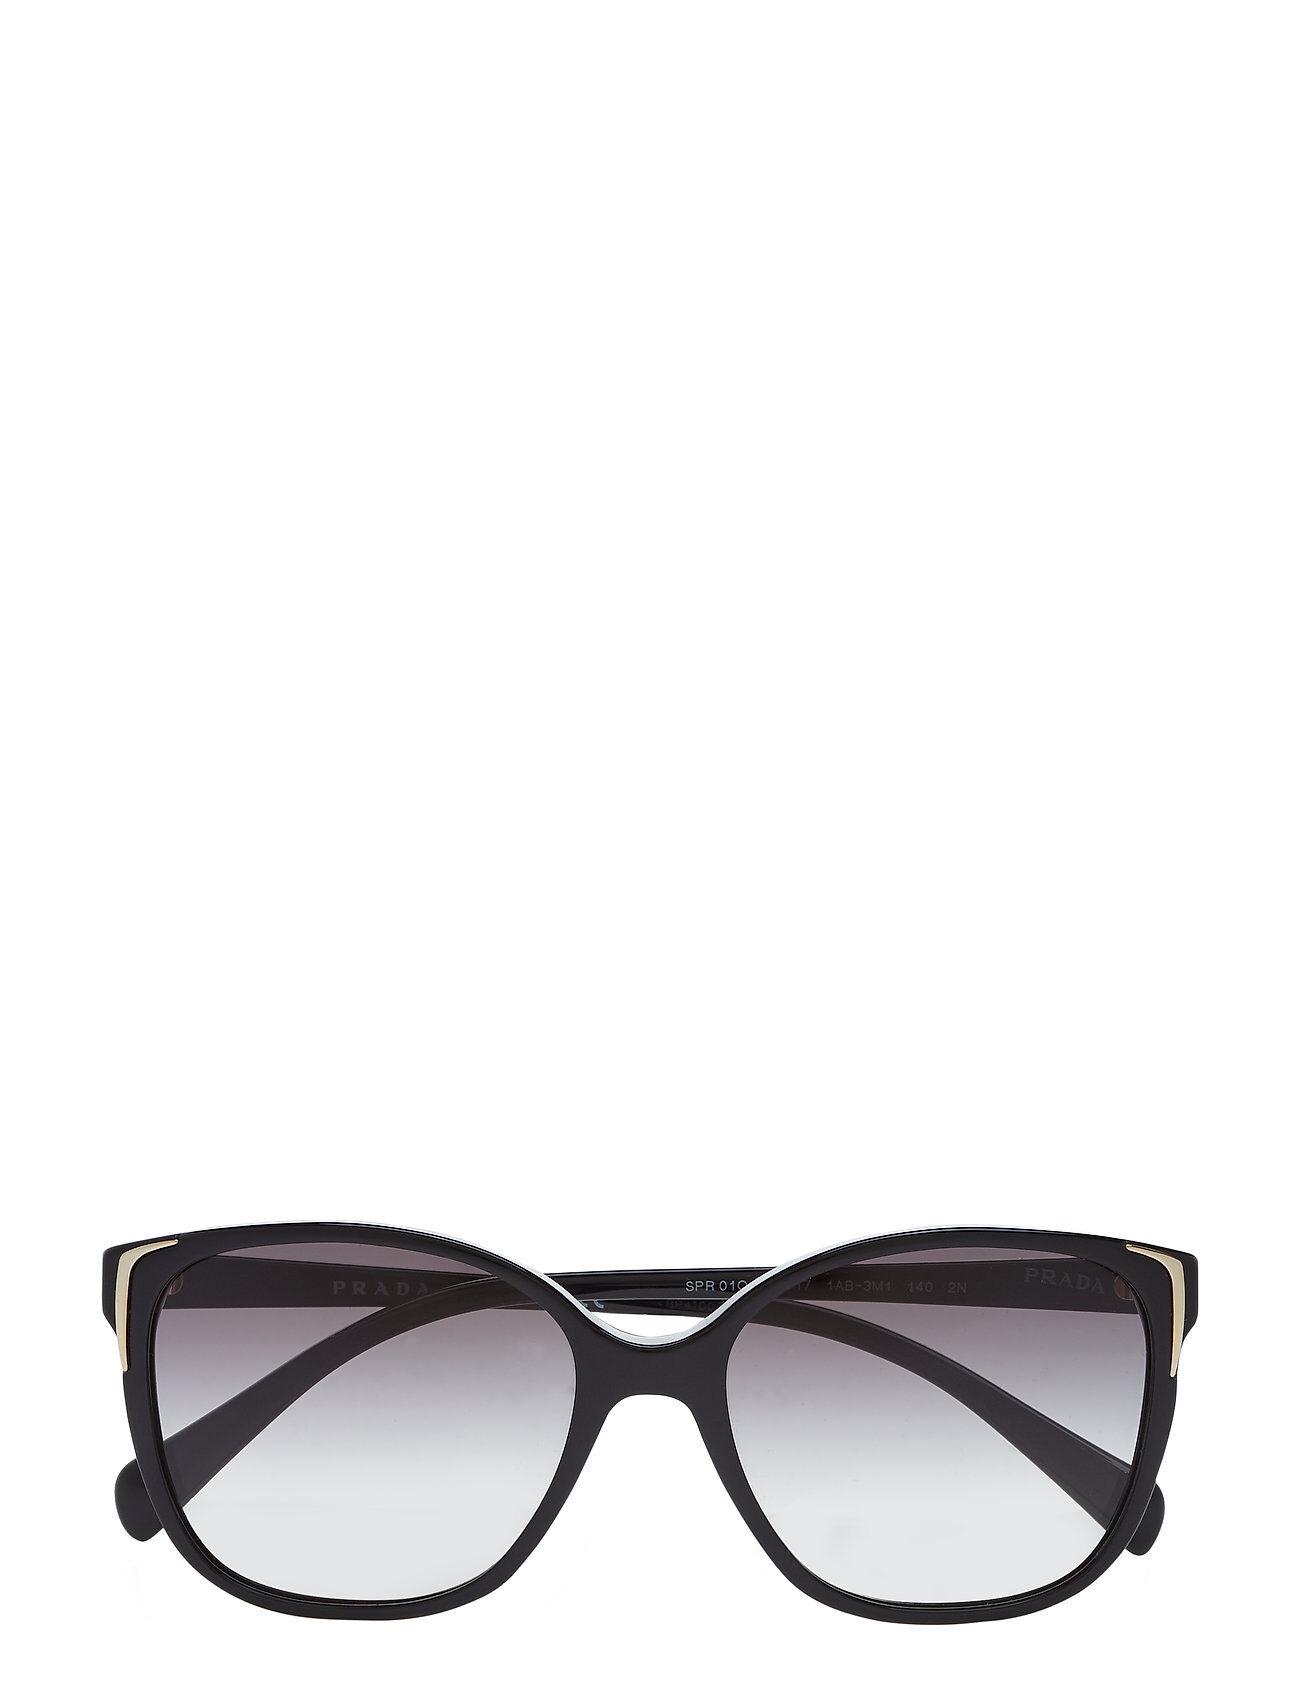 Image of Prada Sunglasses 0pr 01os Wayfarer Aurinkolasit Musta Prada Sunglasses